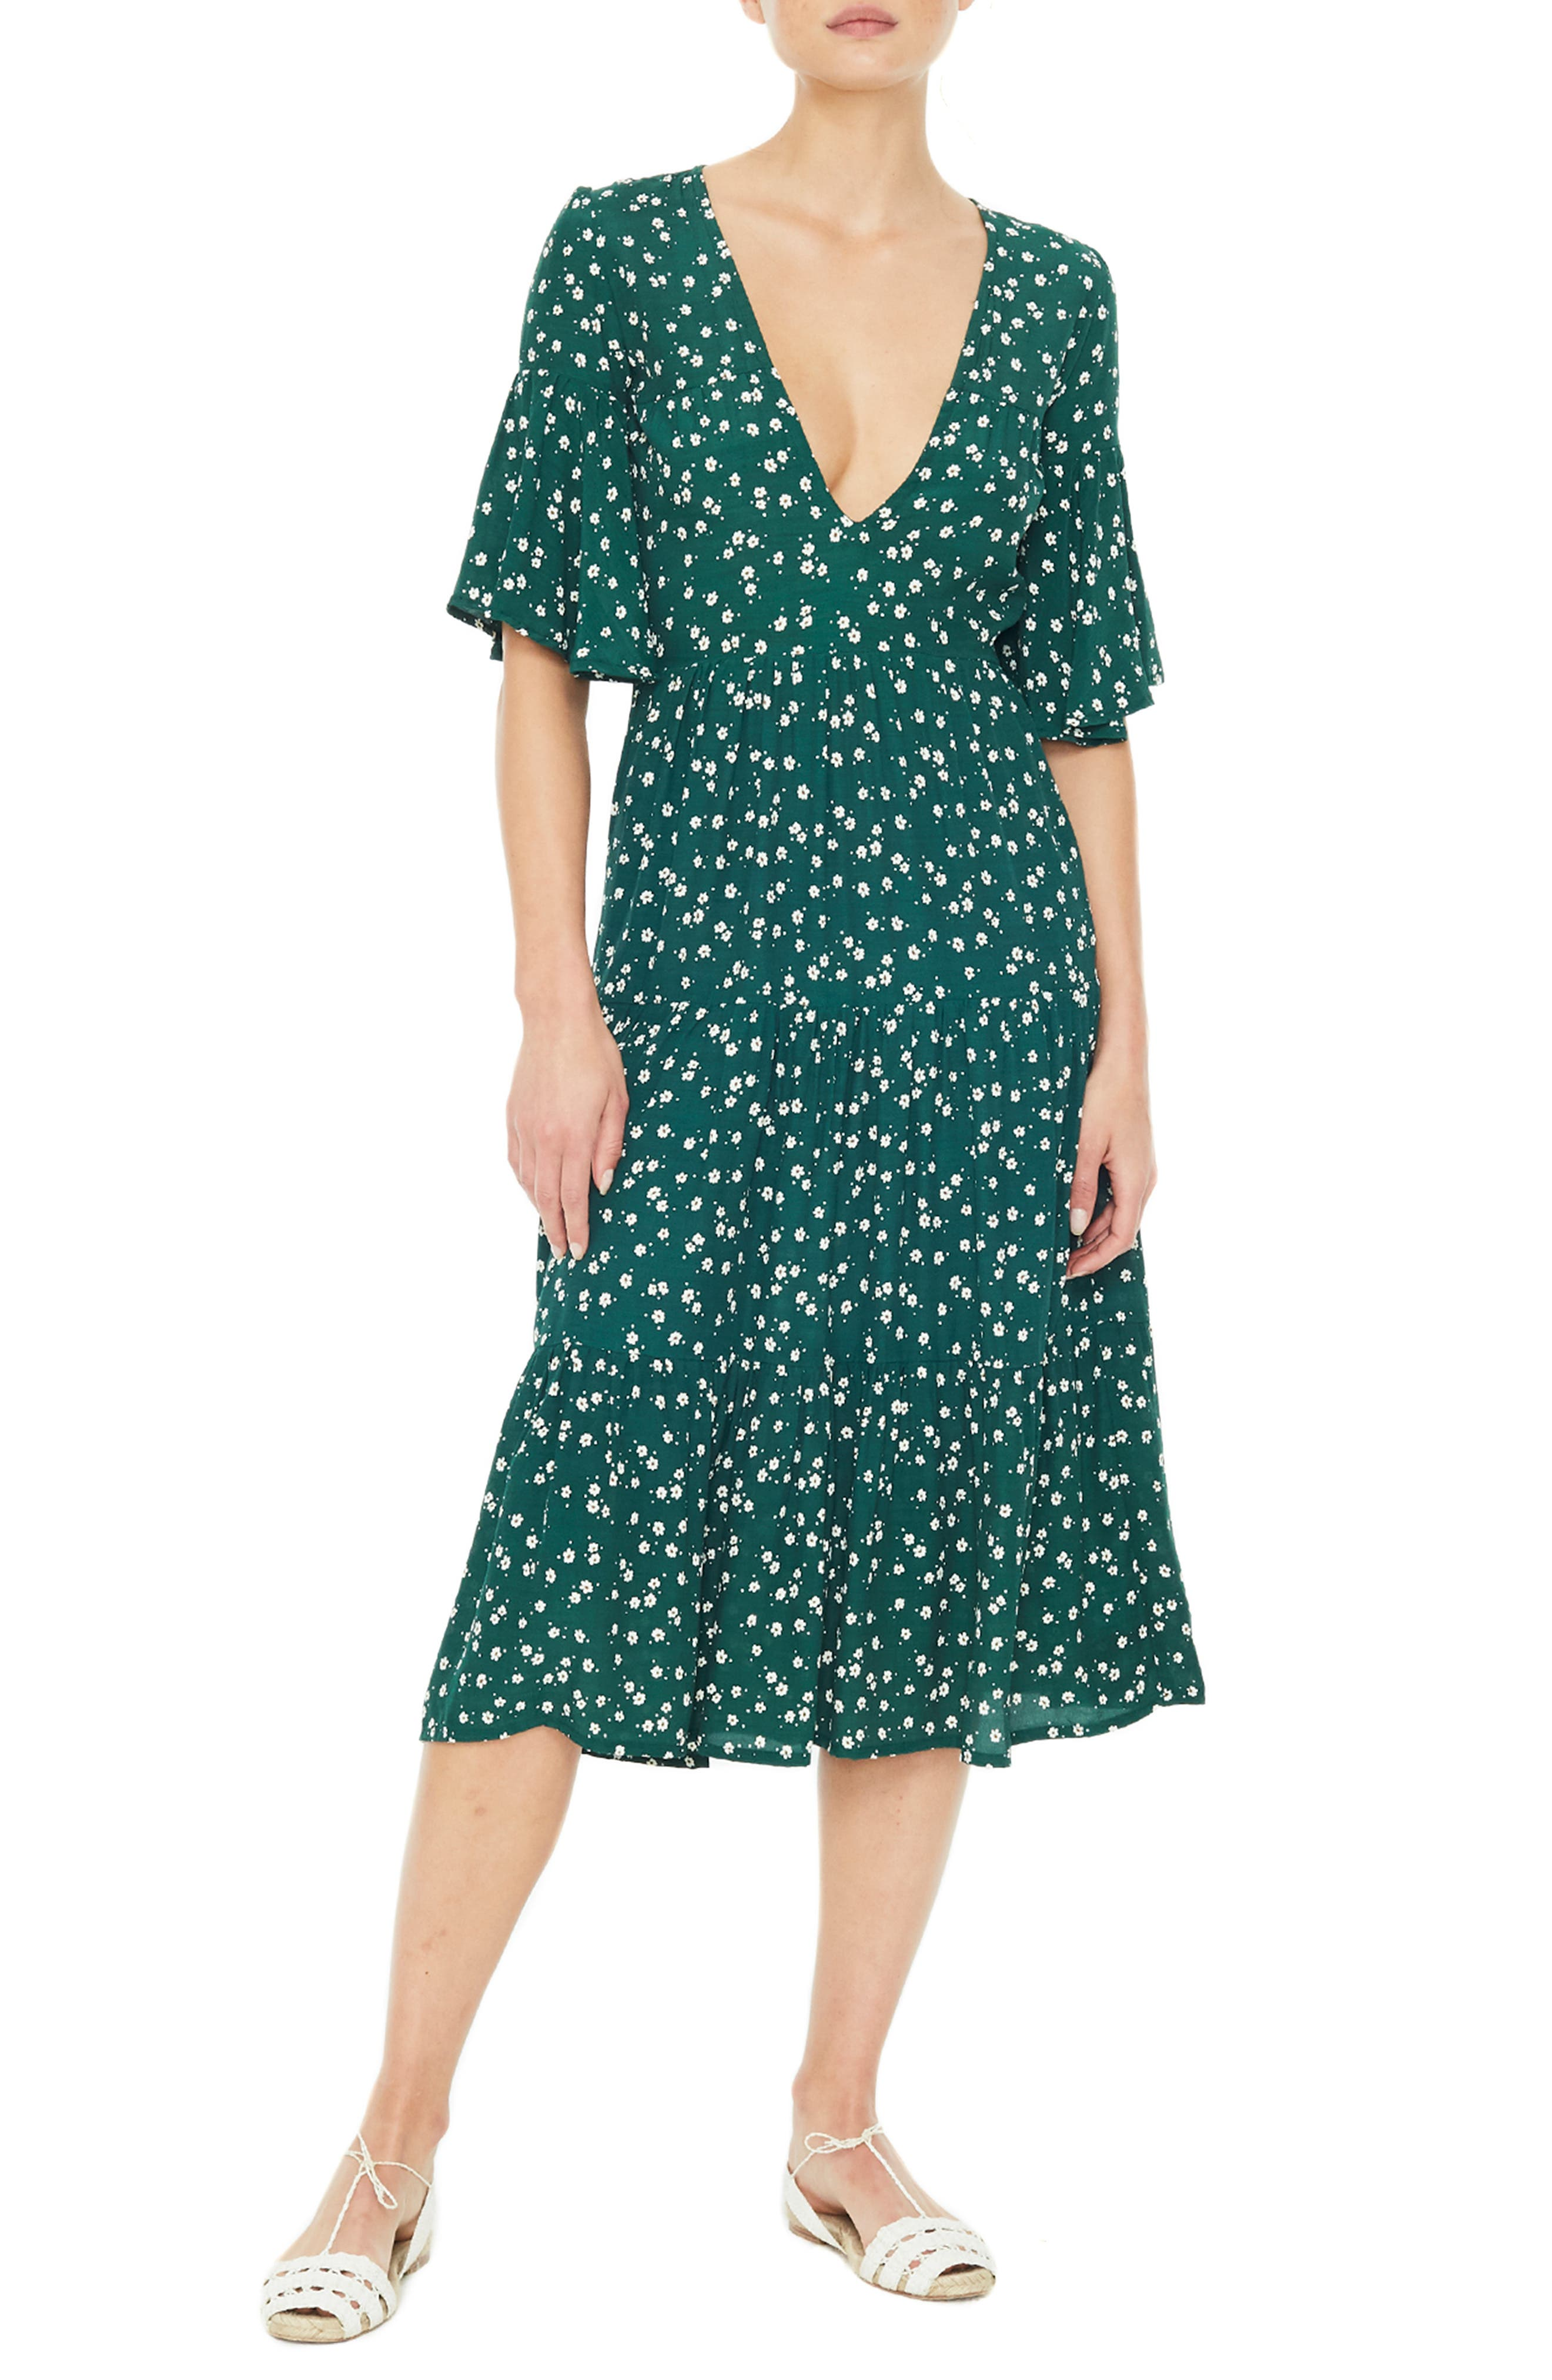 Melia Floral Print Midi Dress by Faithfull The Brand